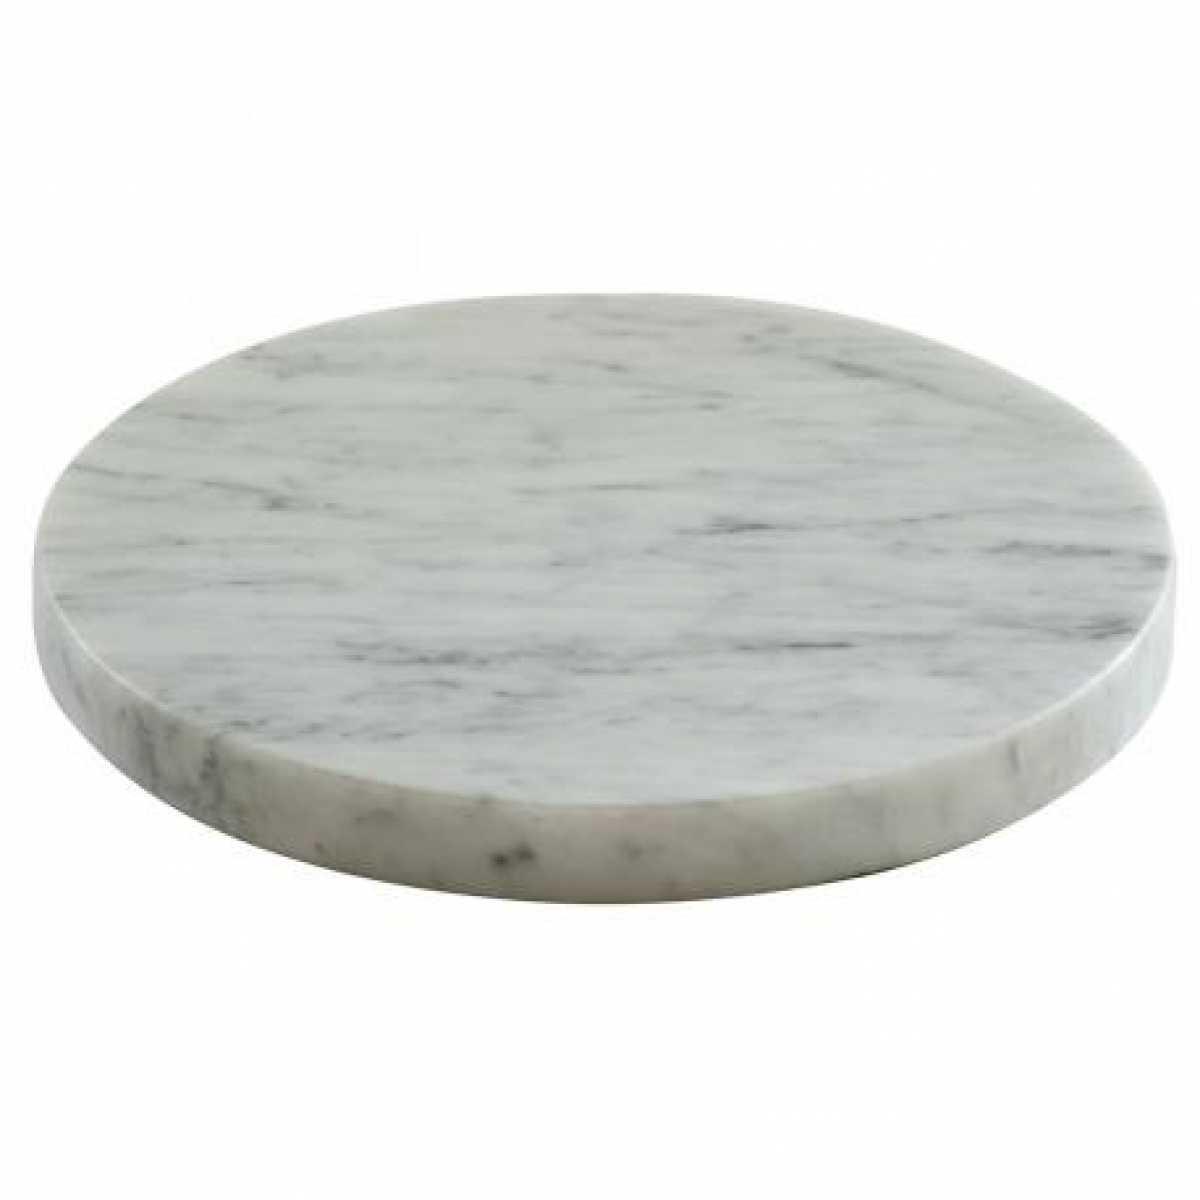 CRASTER Tilt Marble Round Plinth - Beyaz Mermer